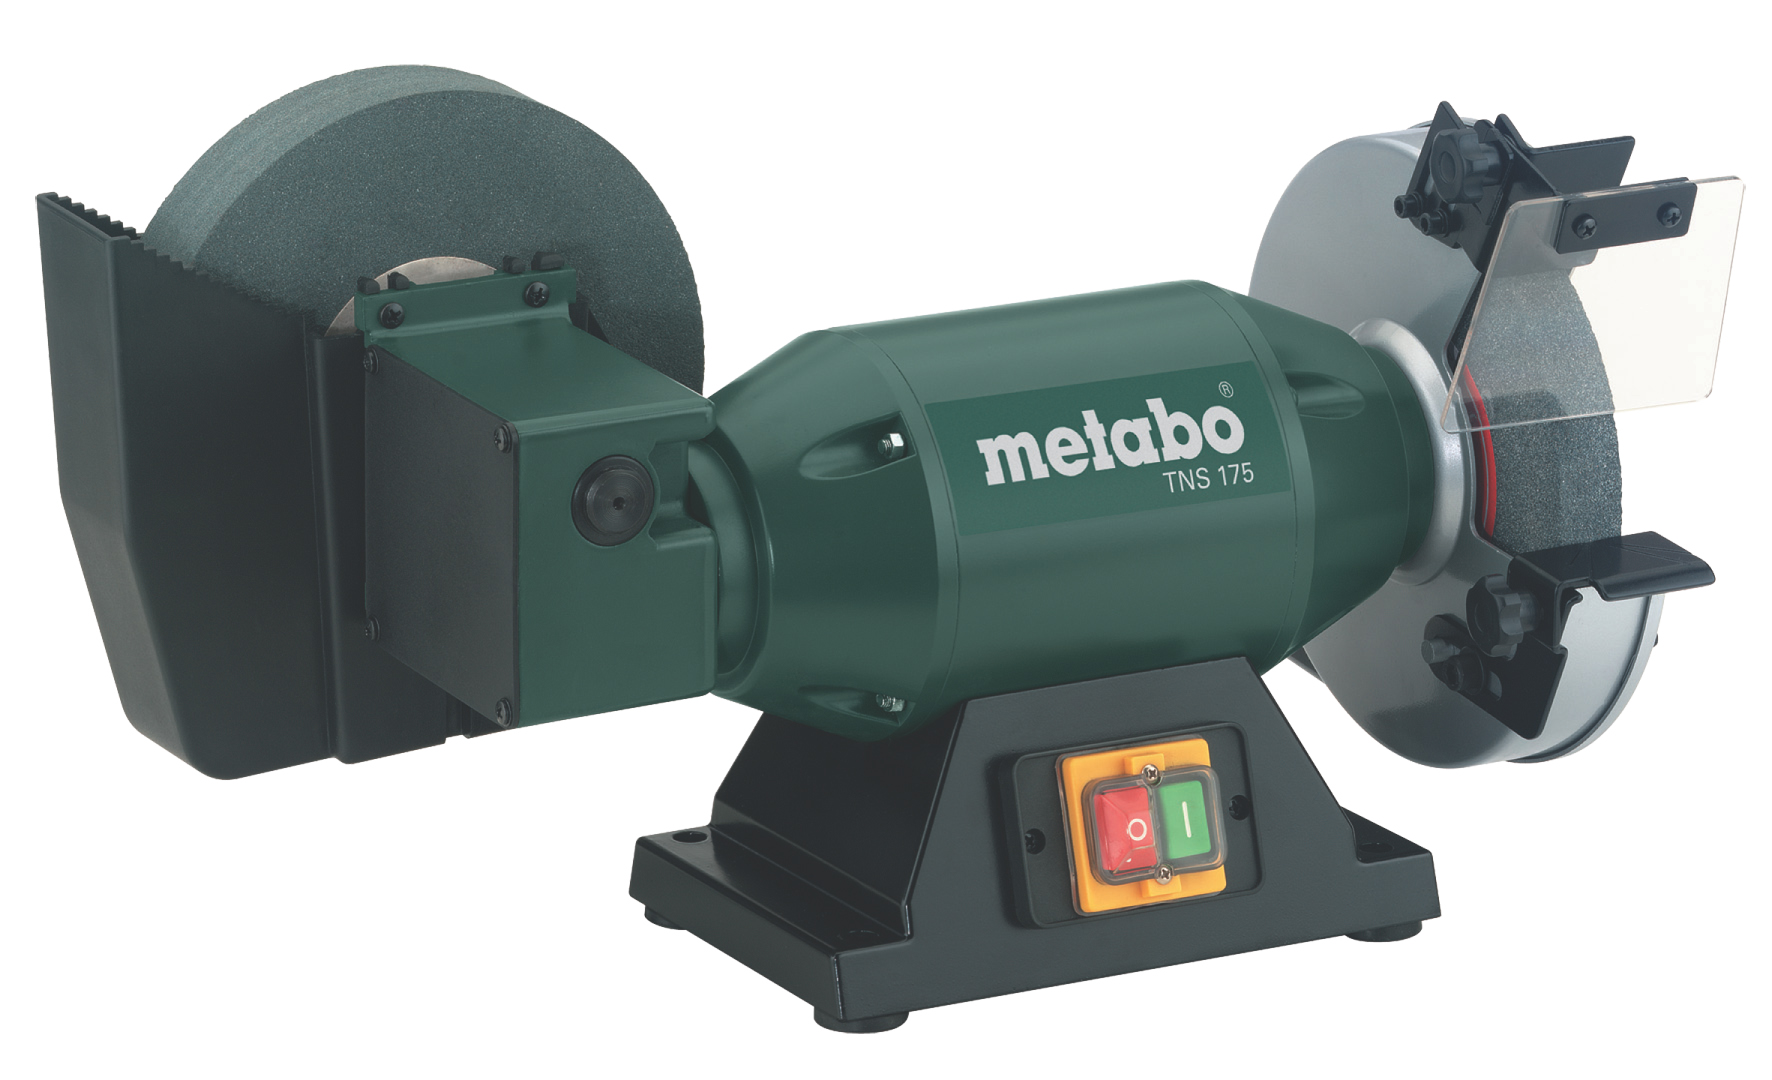 ������ � ���������� � ����������� Metabo Tns 175